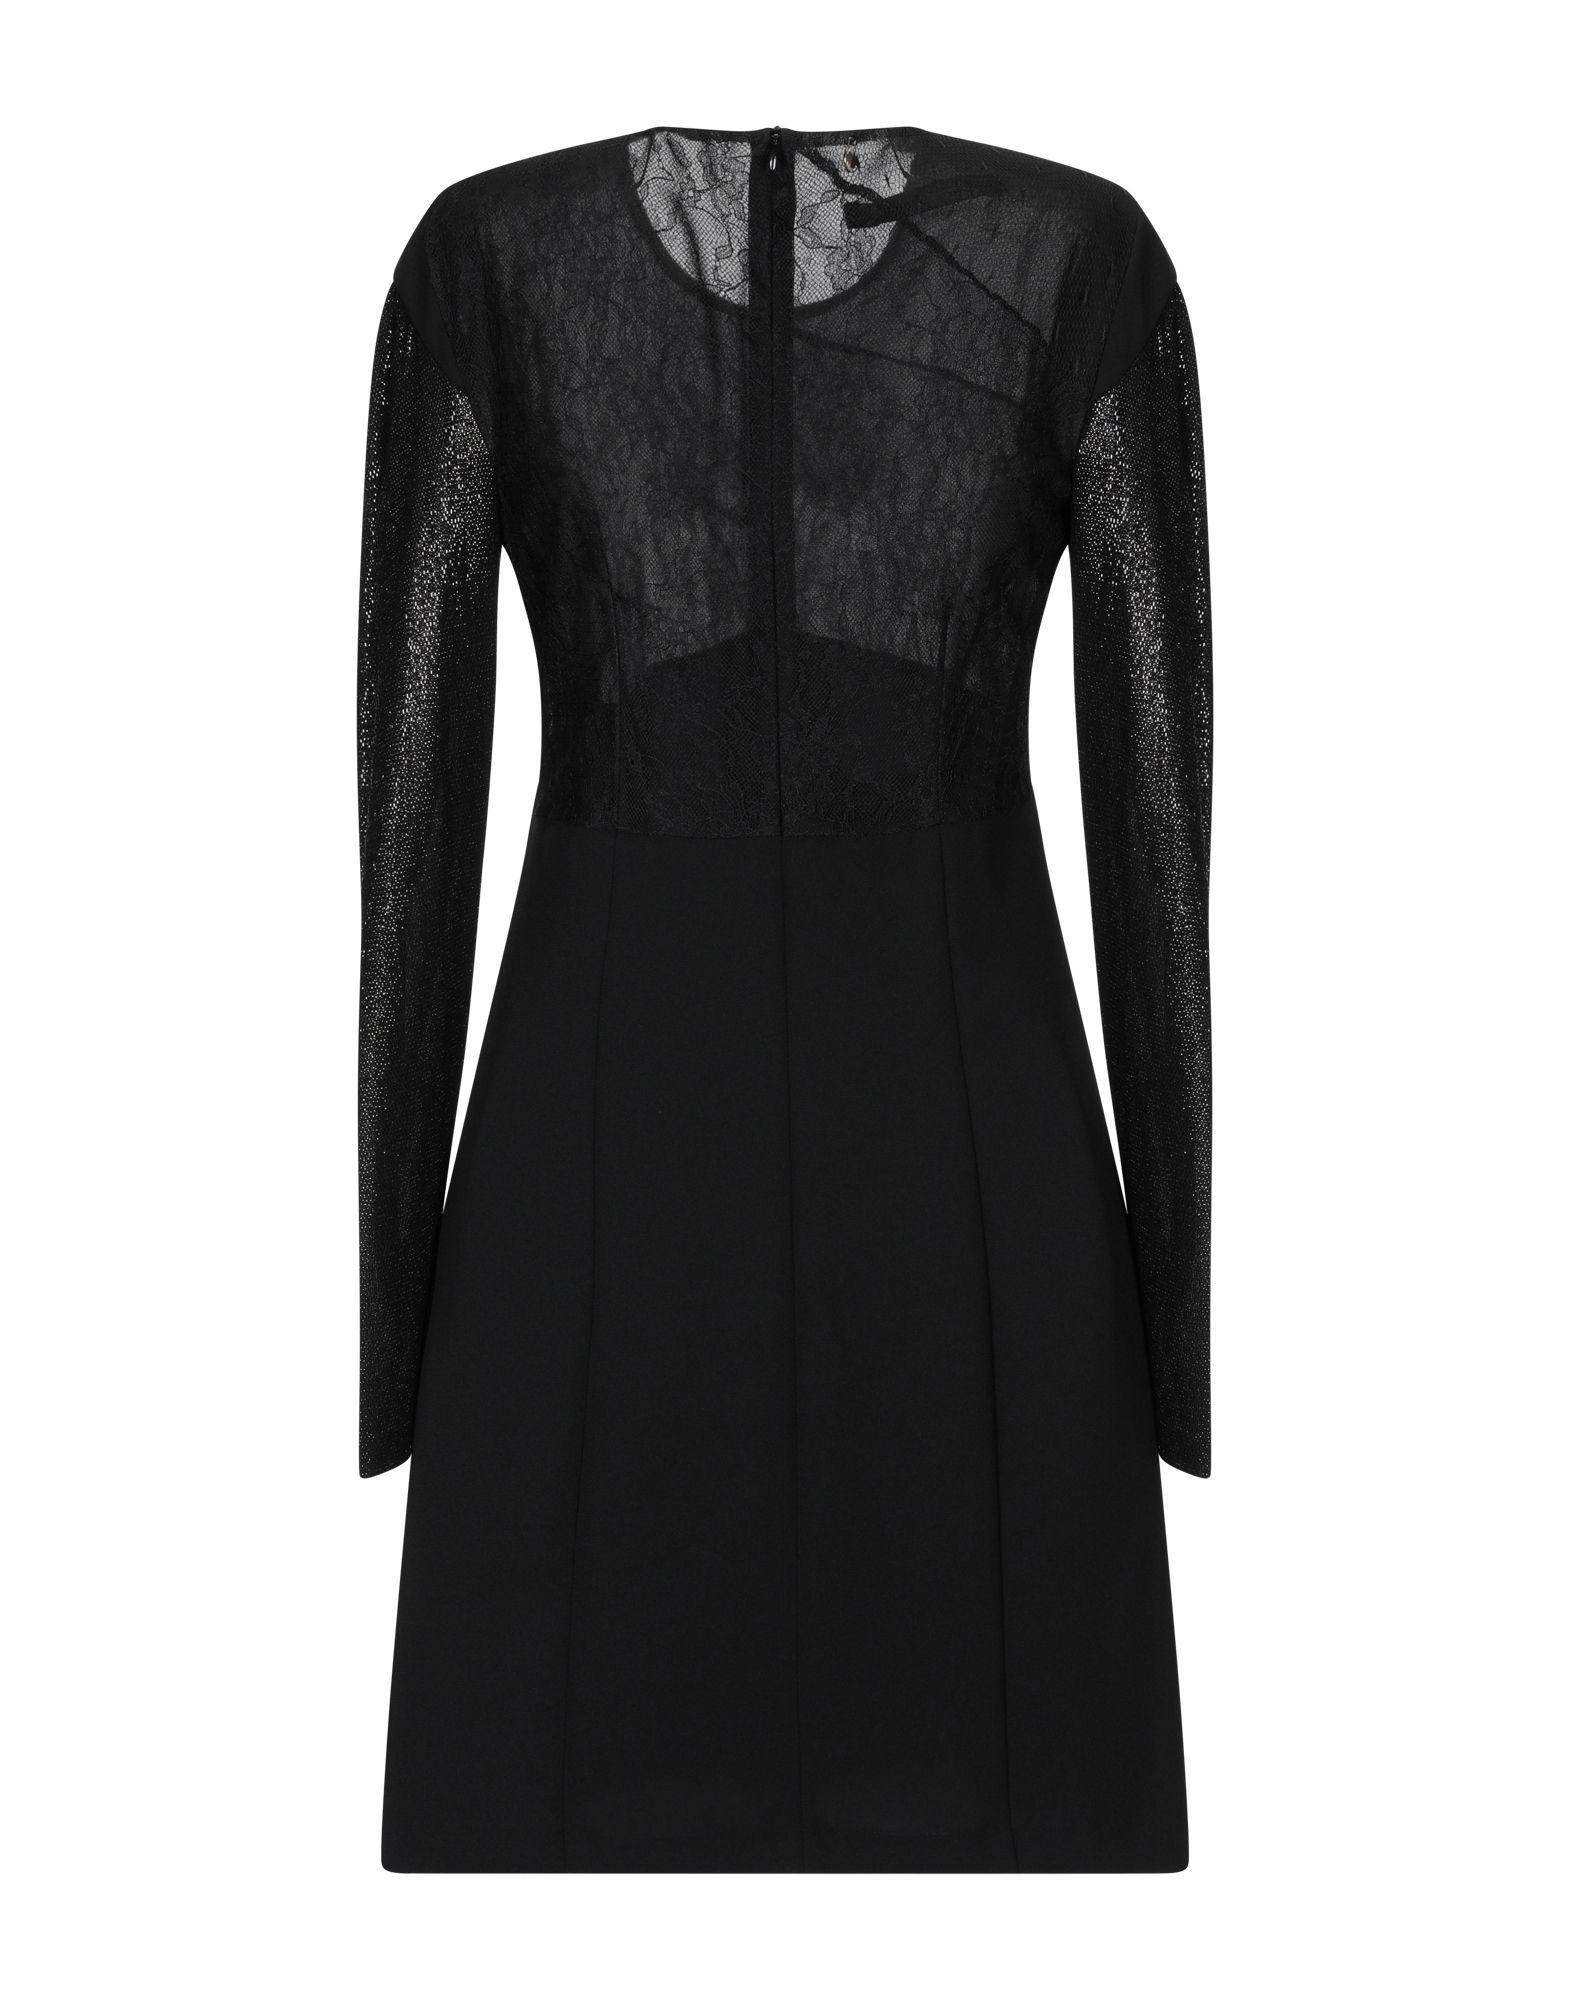 Annarita N Black Lace And Crepe Long Sleeve Dress